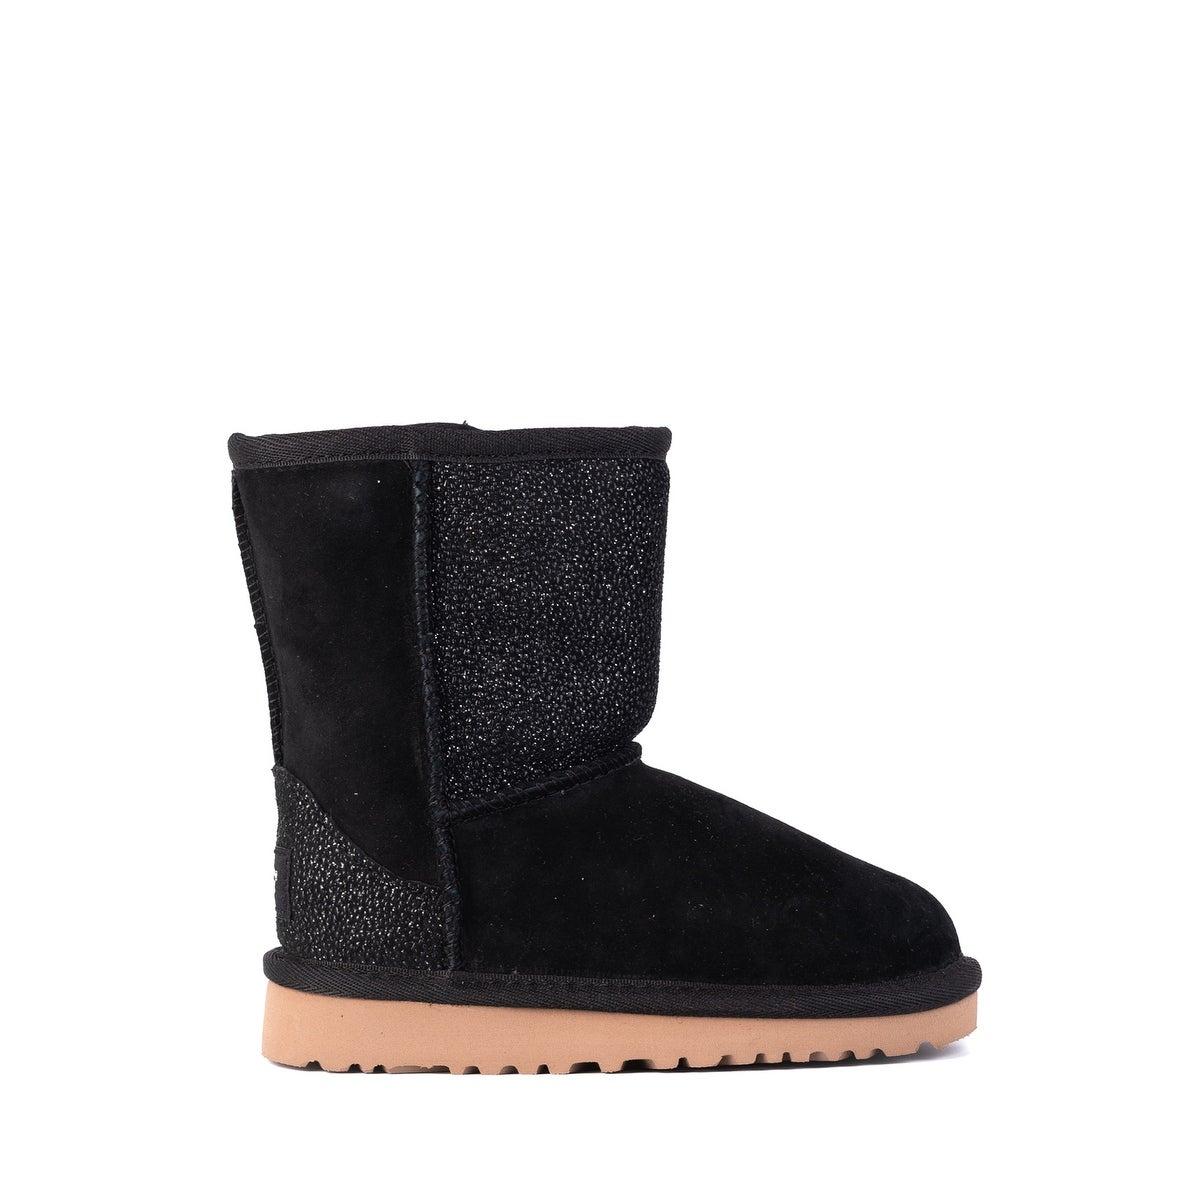 5f0701ad01d UGG Toddler Girls Classic Short Serein Black Glitter Boots Size US9~RTL$100